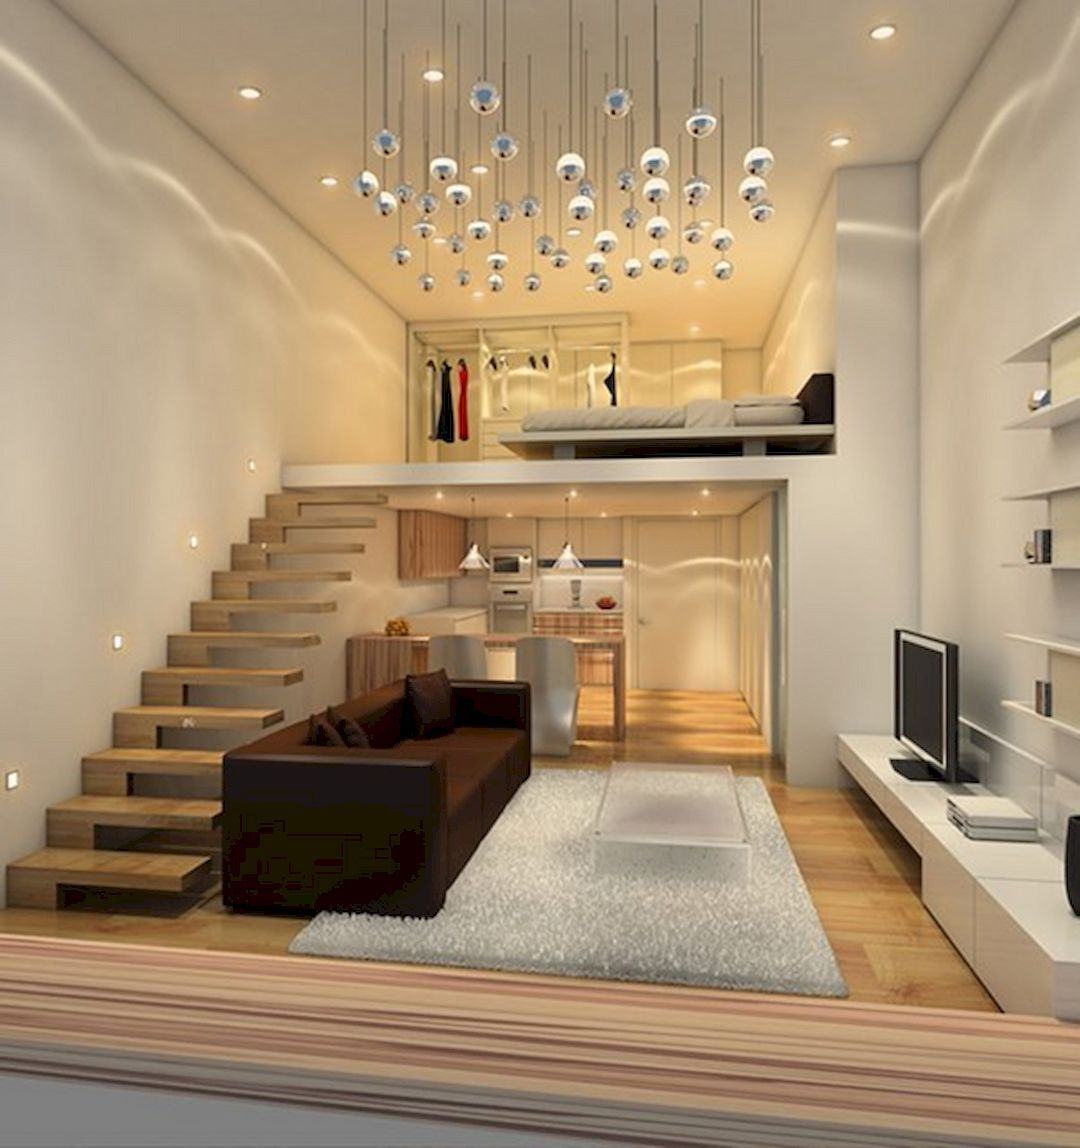 Cool Modern Interior Design: 80 Super Cool Modern Home Or Apartment Interior Ideas